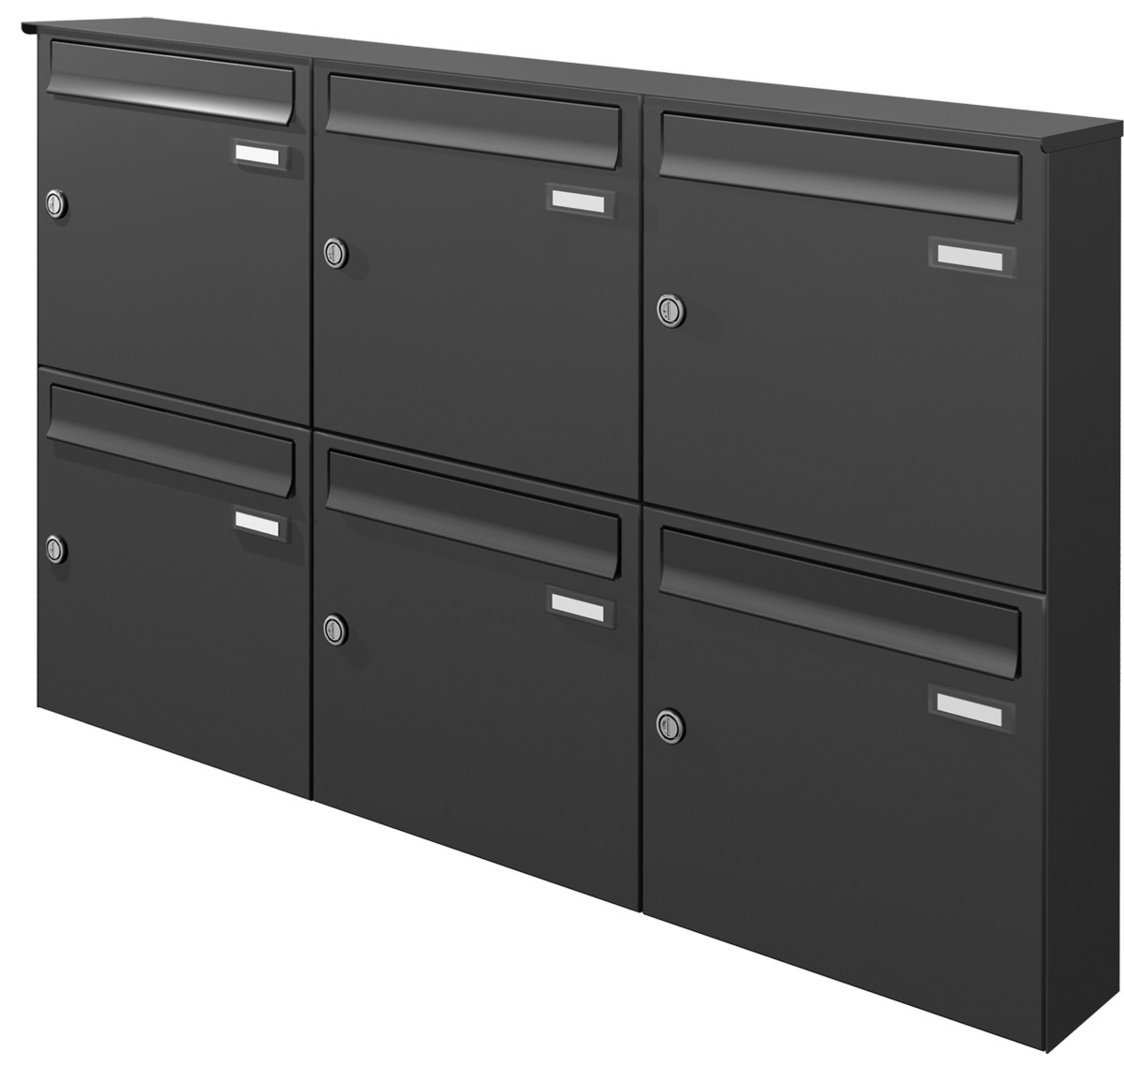 aph116 knobloch aufputz briefkasten 6 tlg tiefe 100. Black Bedroom Furniture Sets. Home Design Ideas